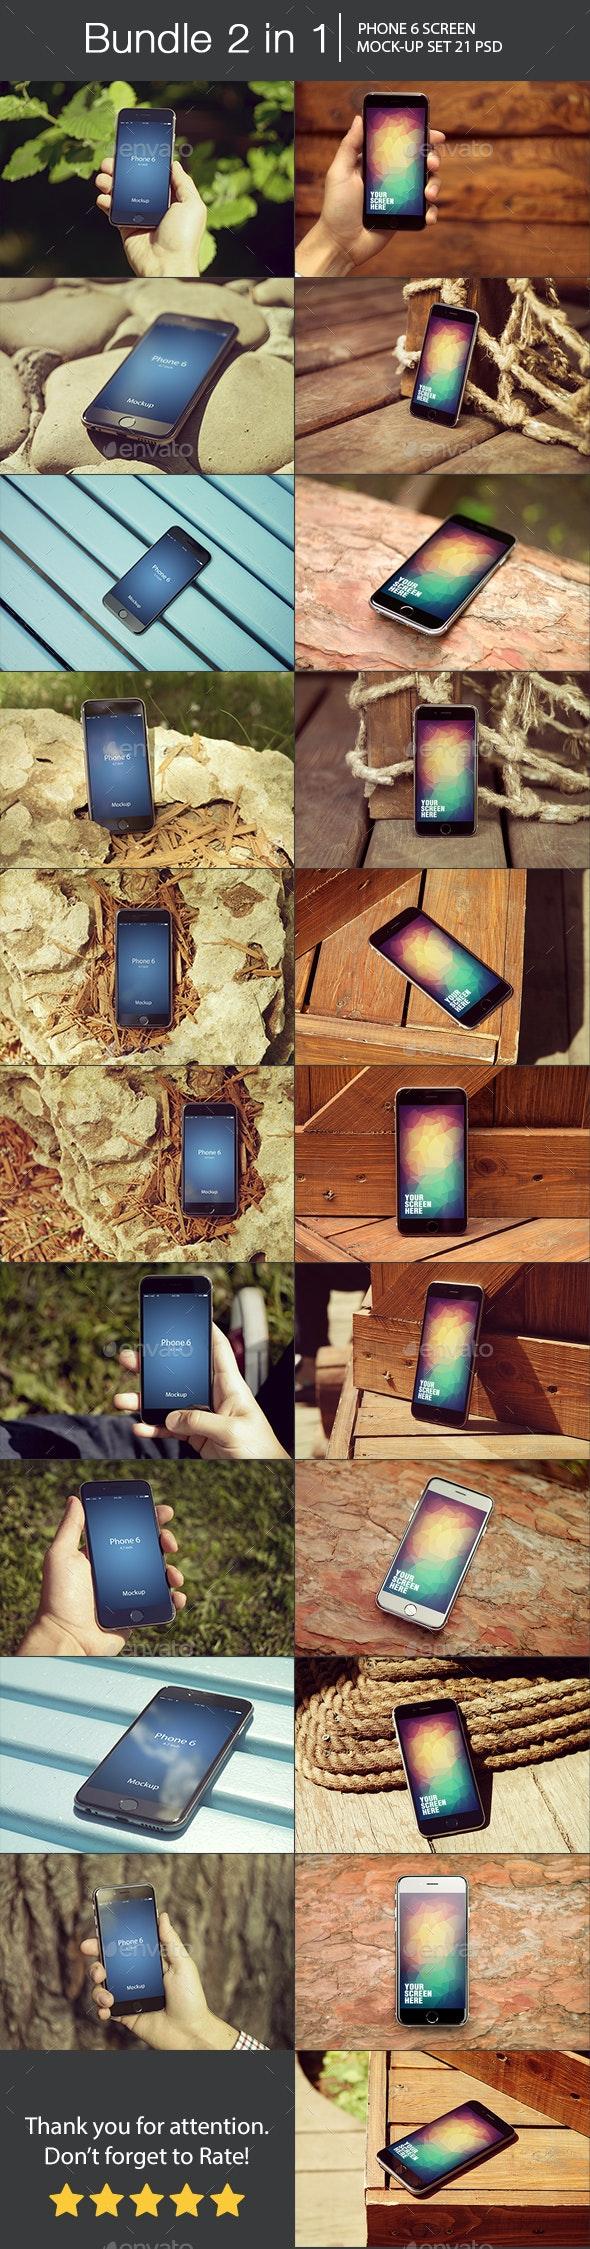 iPhone 6 Mockup Bundle 2 in 1 - Mobile Displays